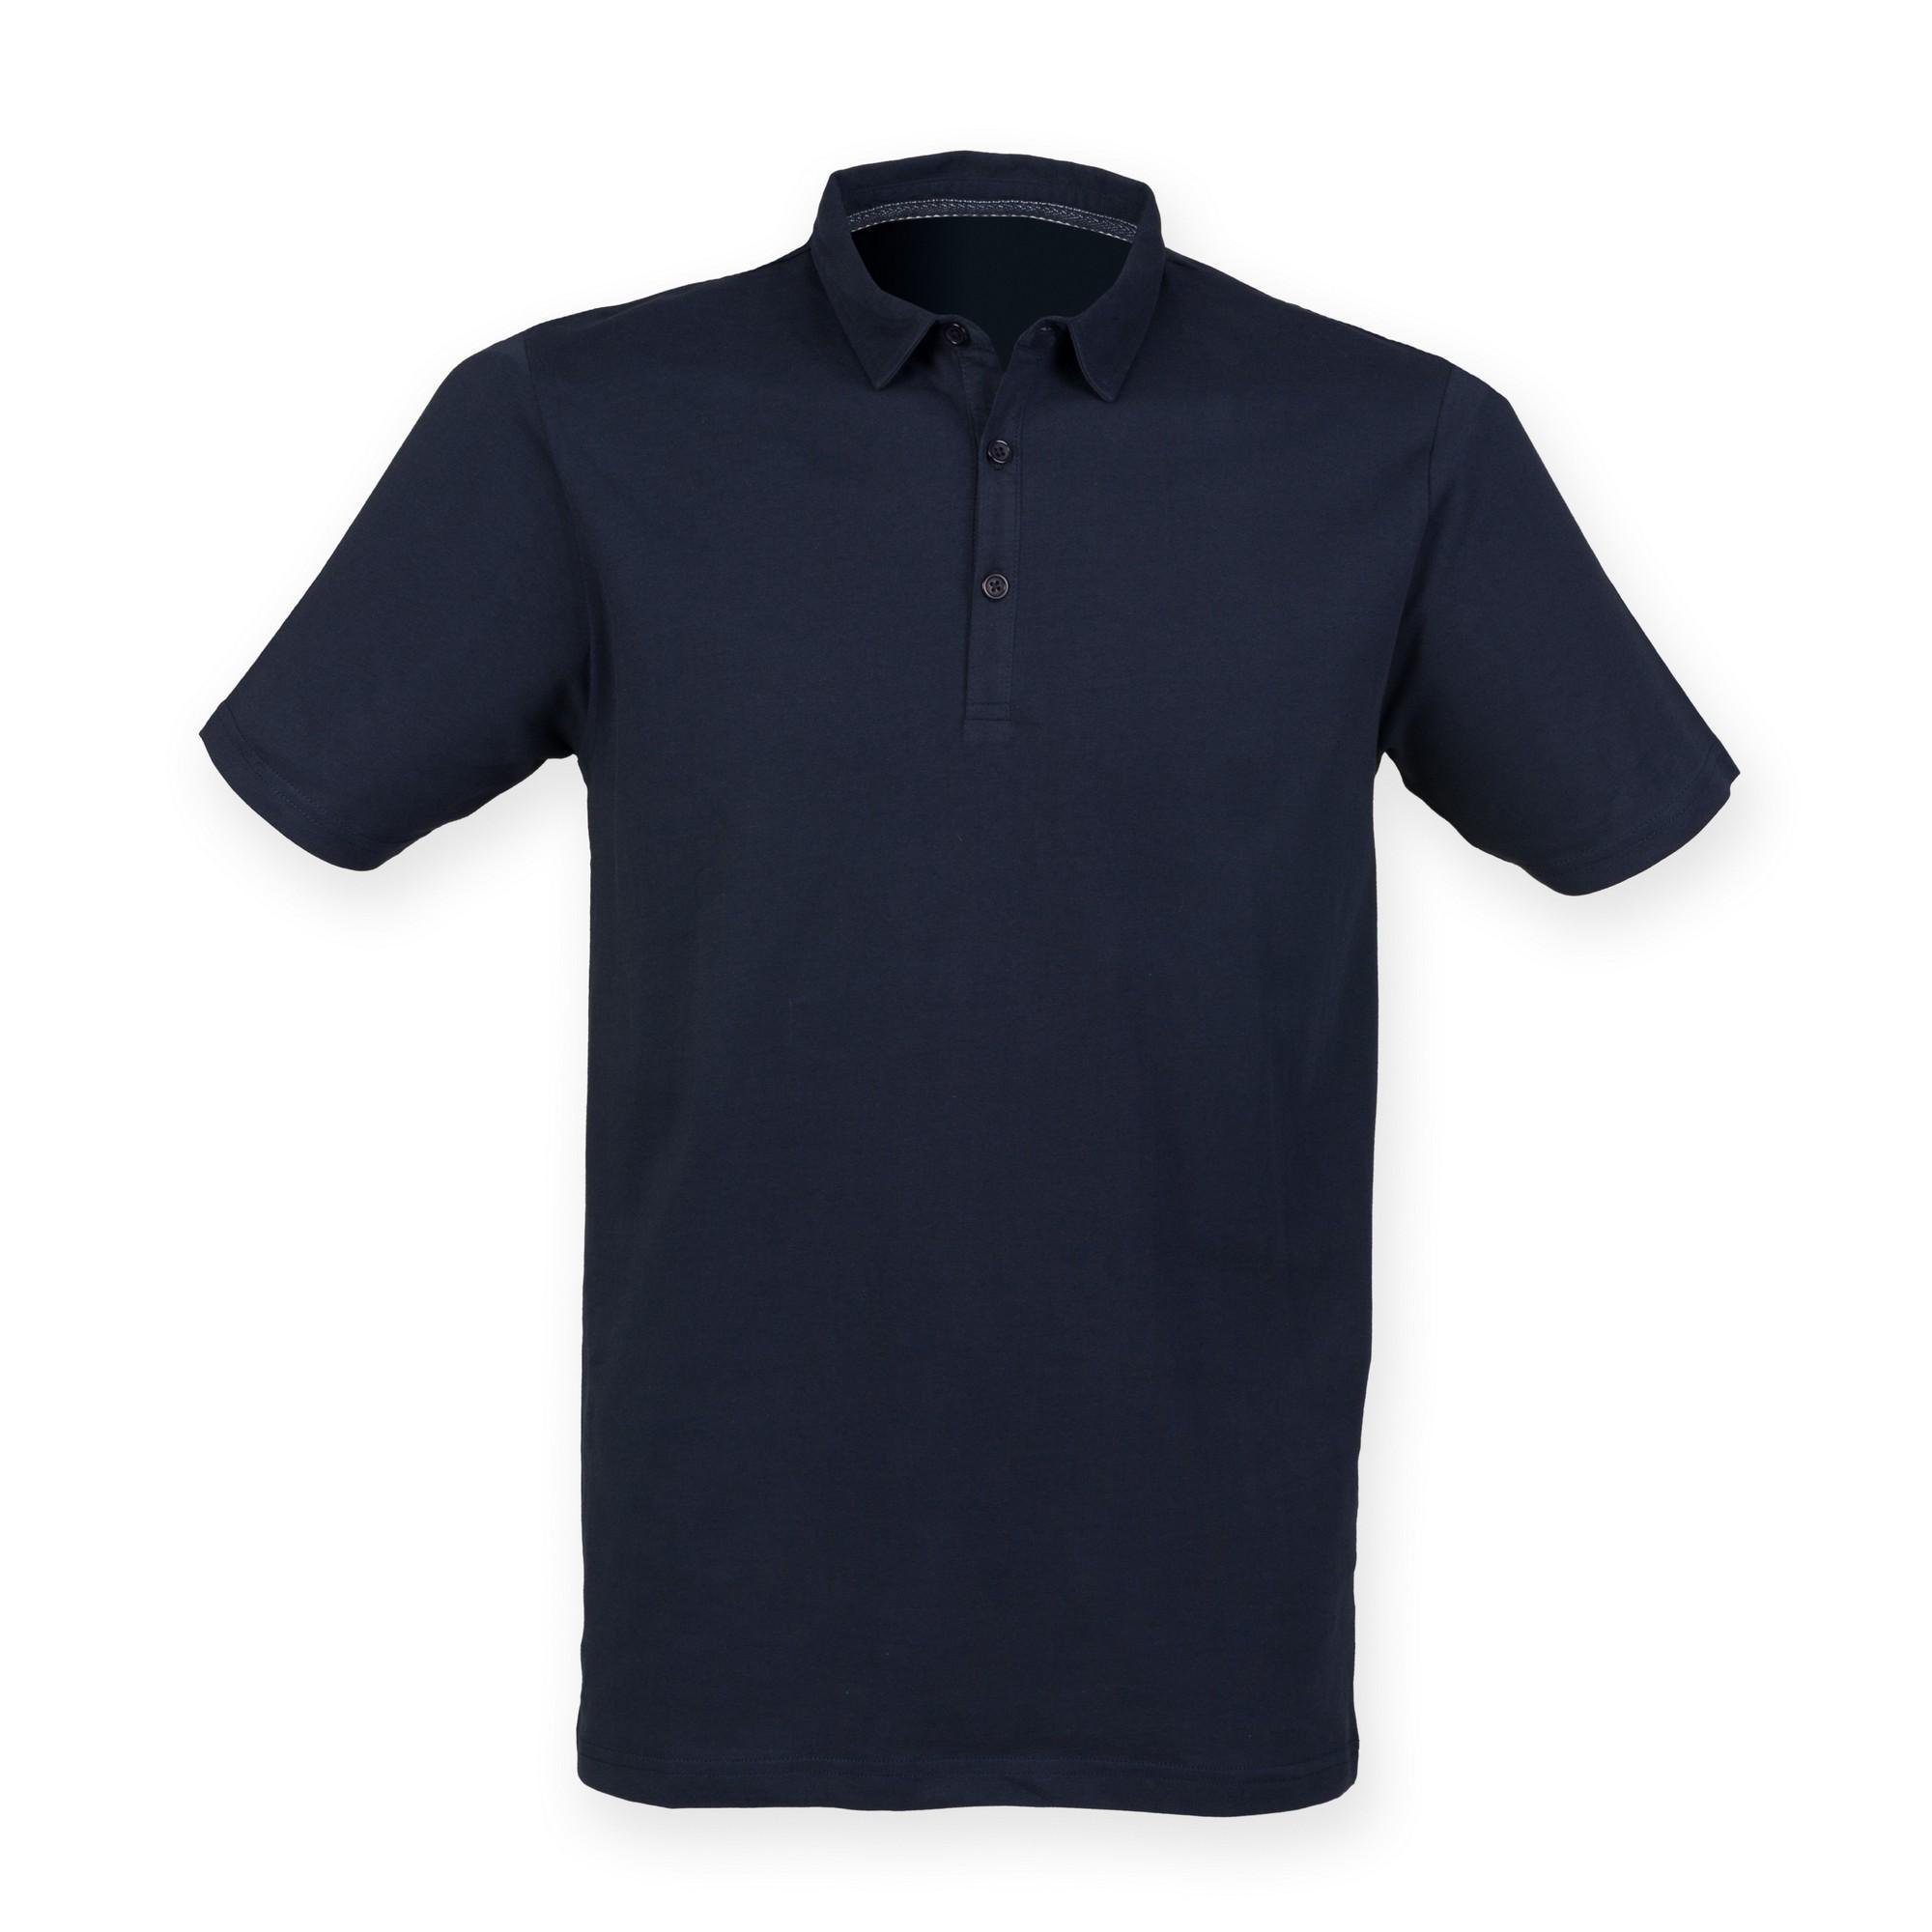 Skinnifit Mens Fashion Short Sleeve Polo Shirt (XL) (Navy)